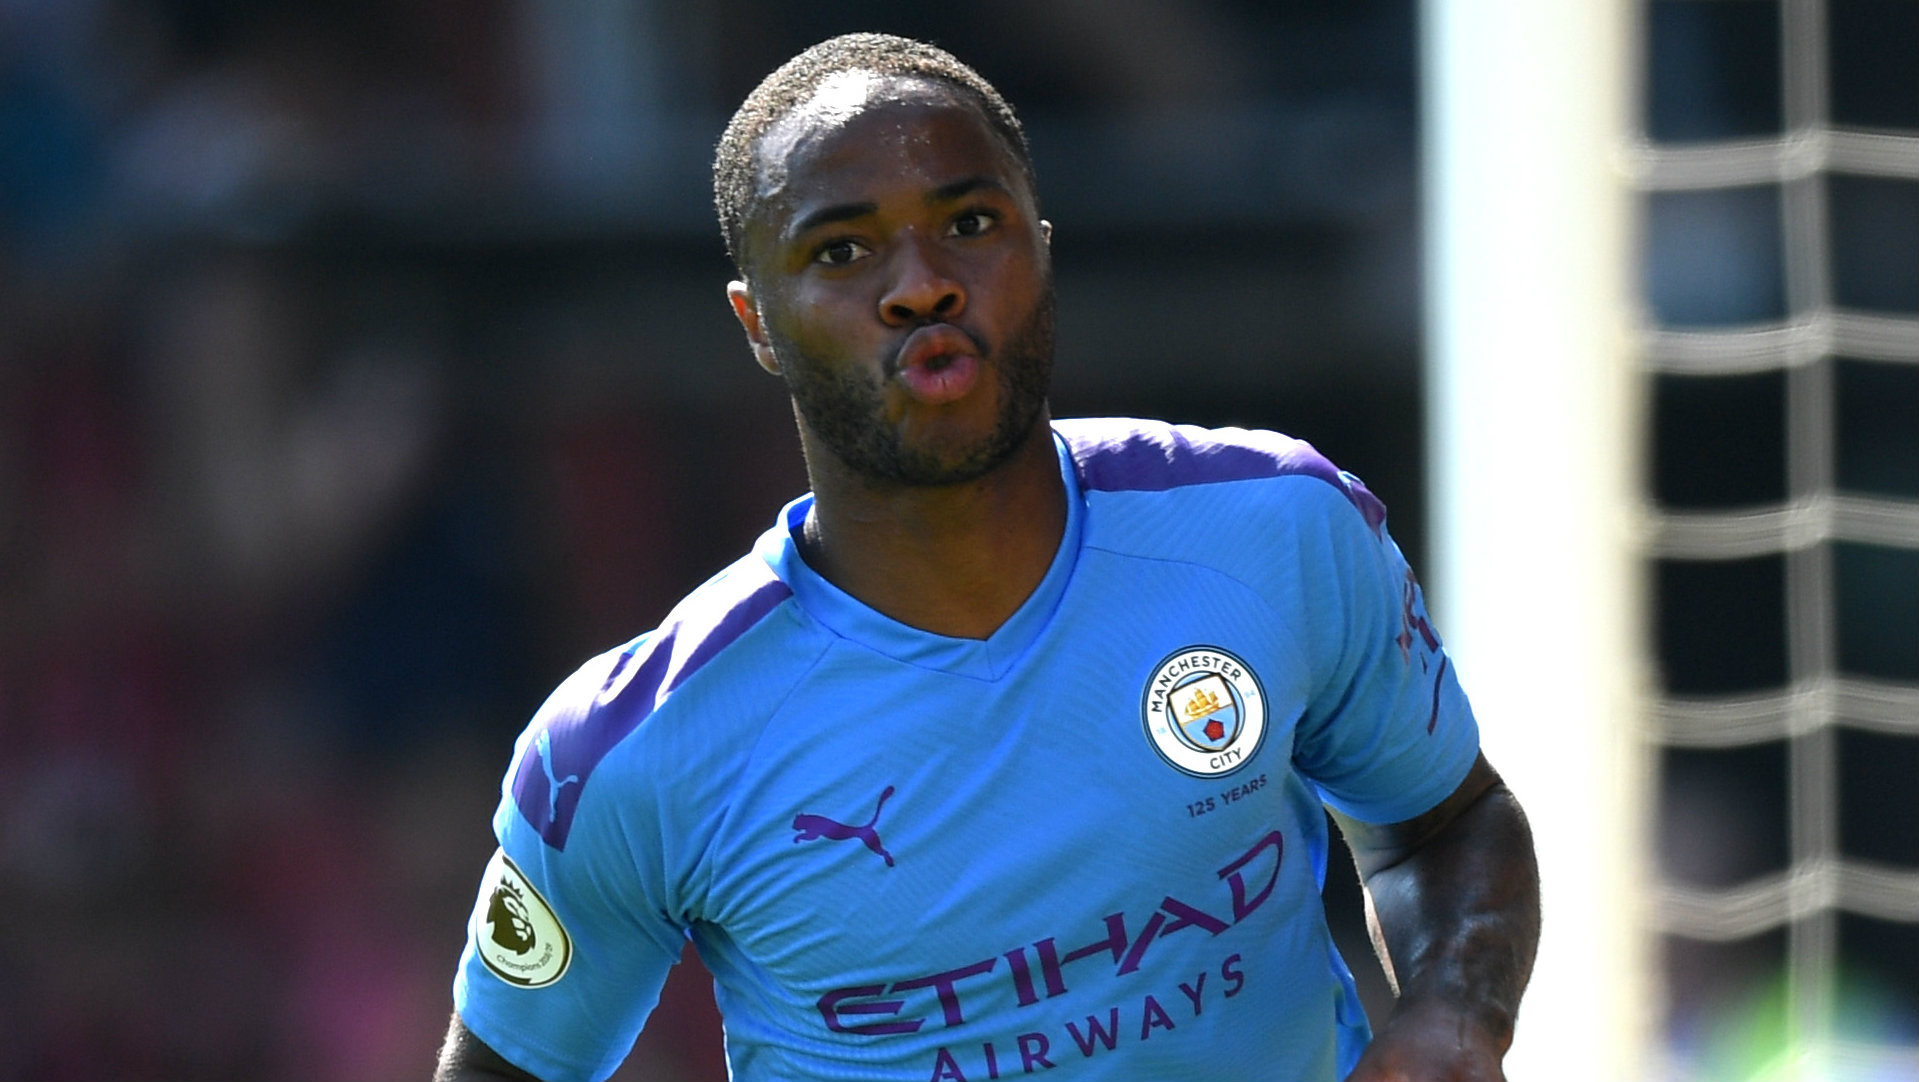 Raheem Sterling Bournemouth vs Manchester City 2019-20